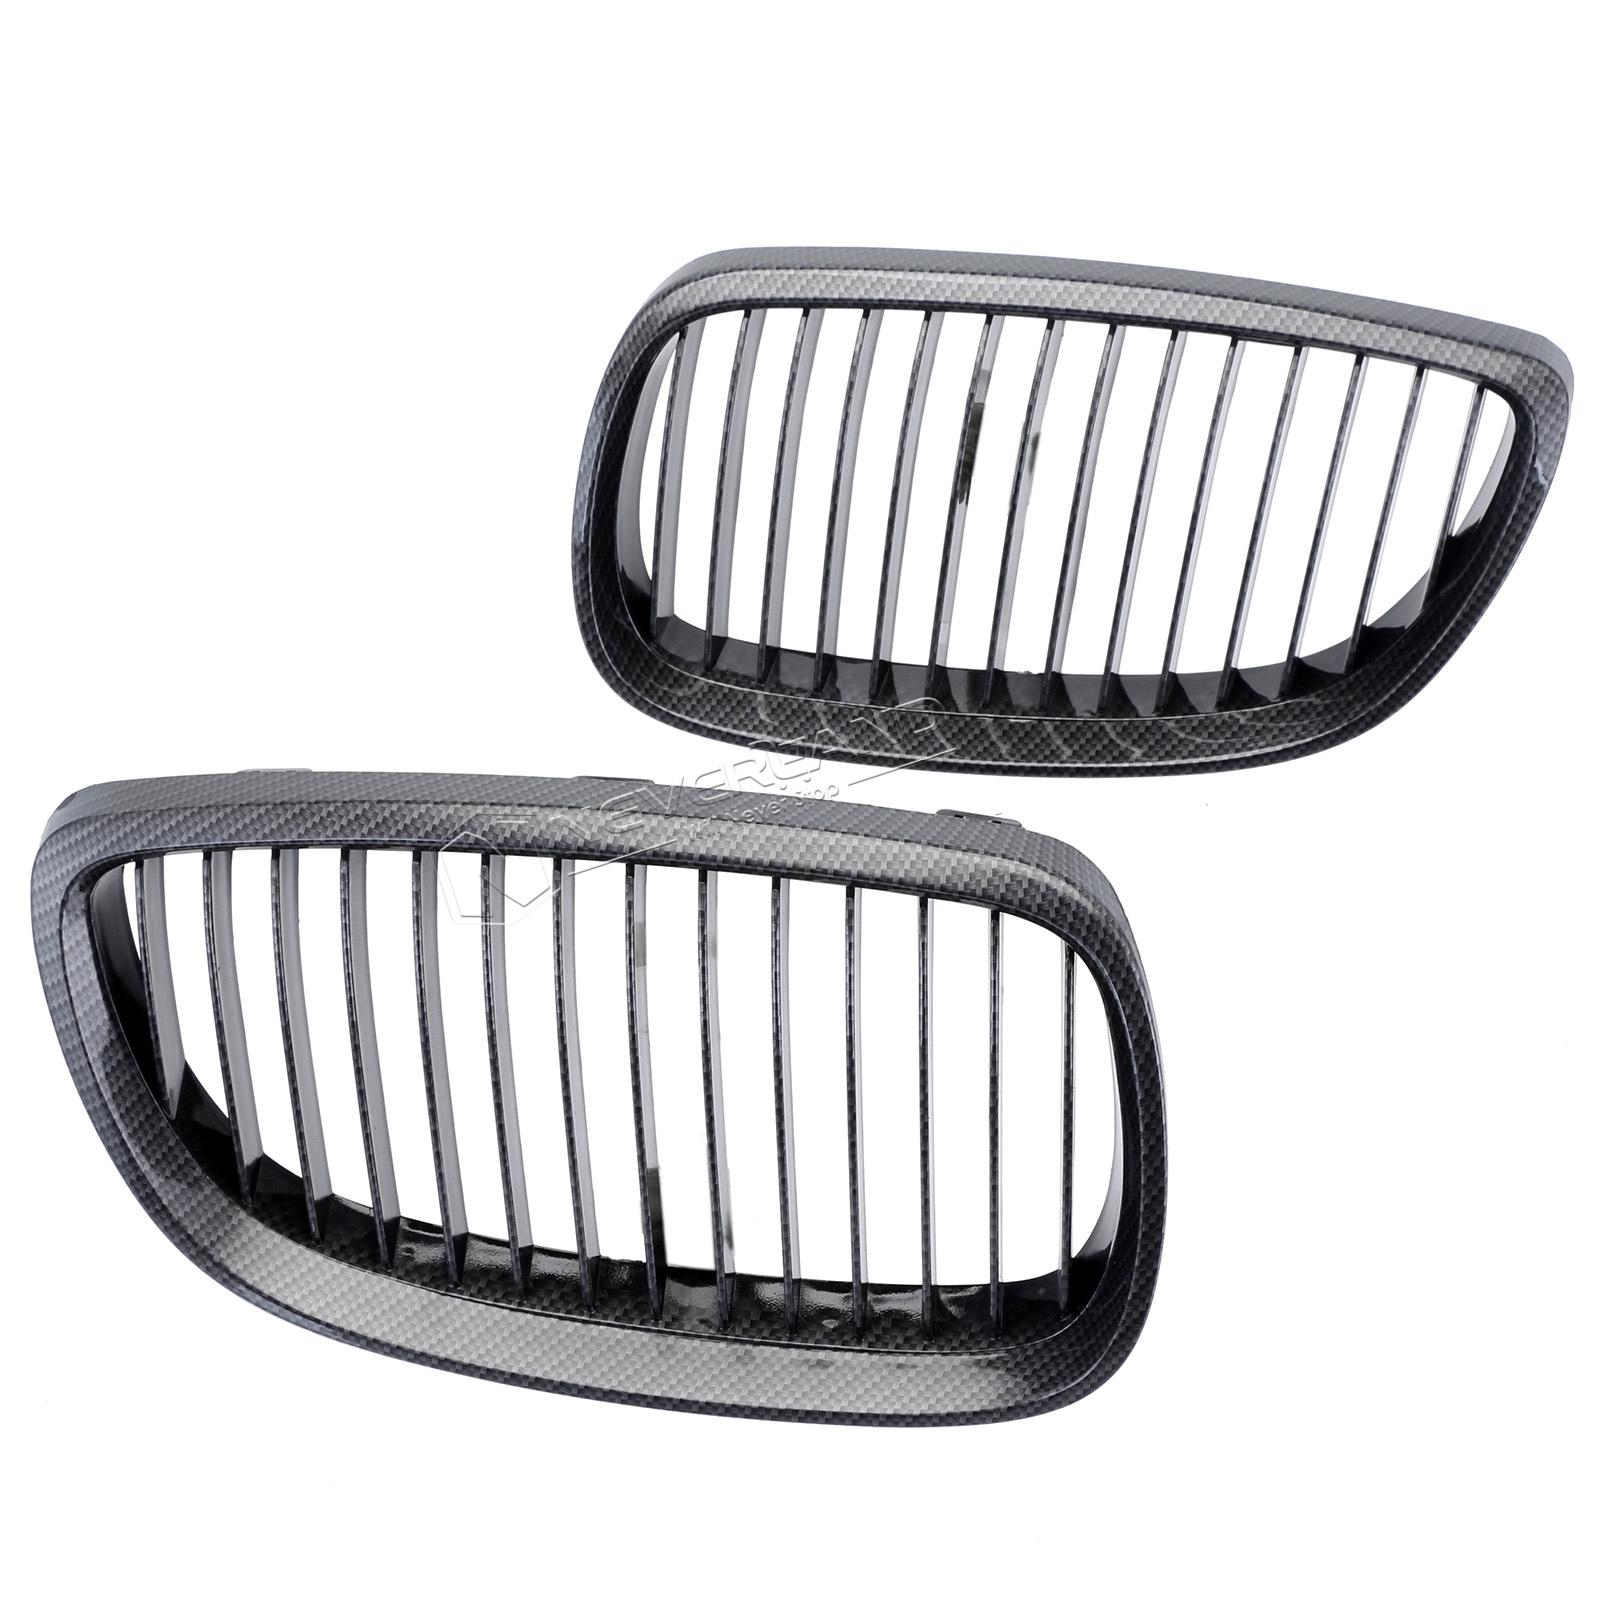 2pcs Carbon Fiber Black Car Grille Grid Front Bumper For